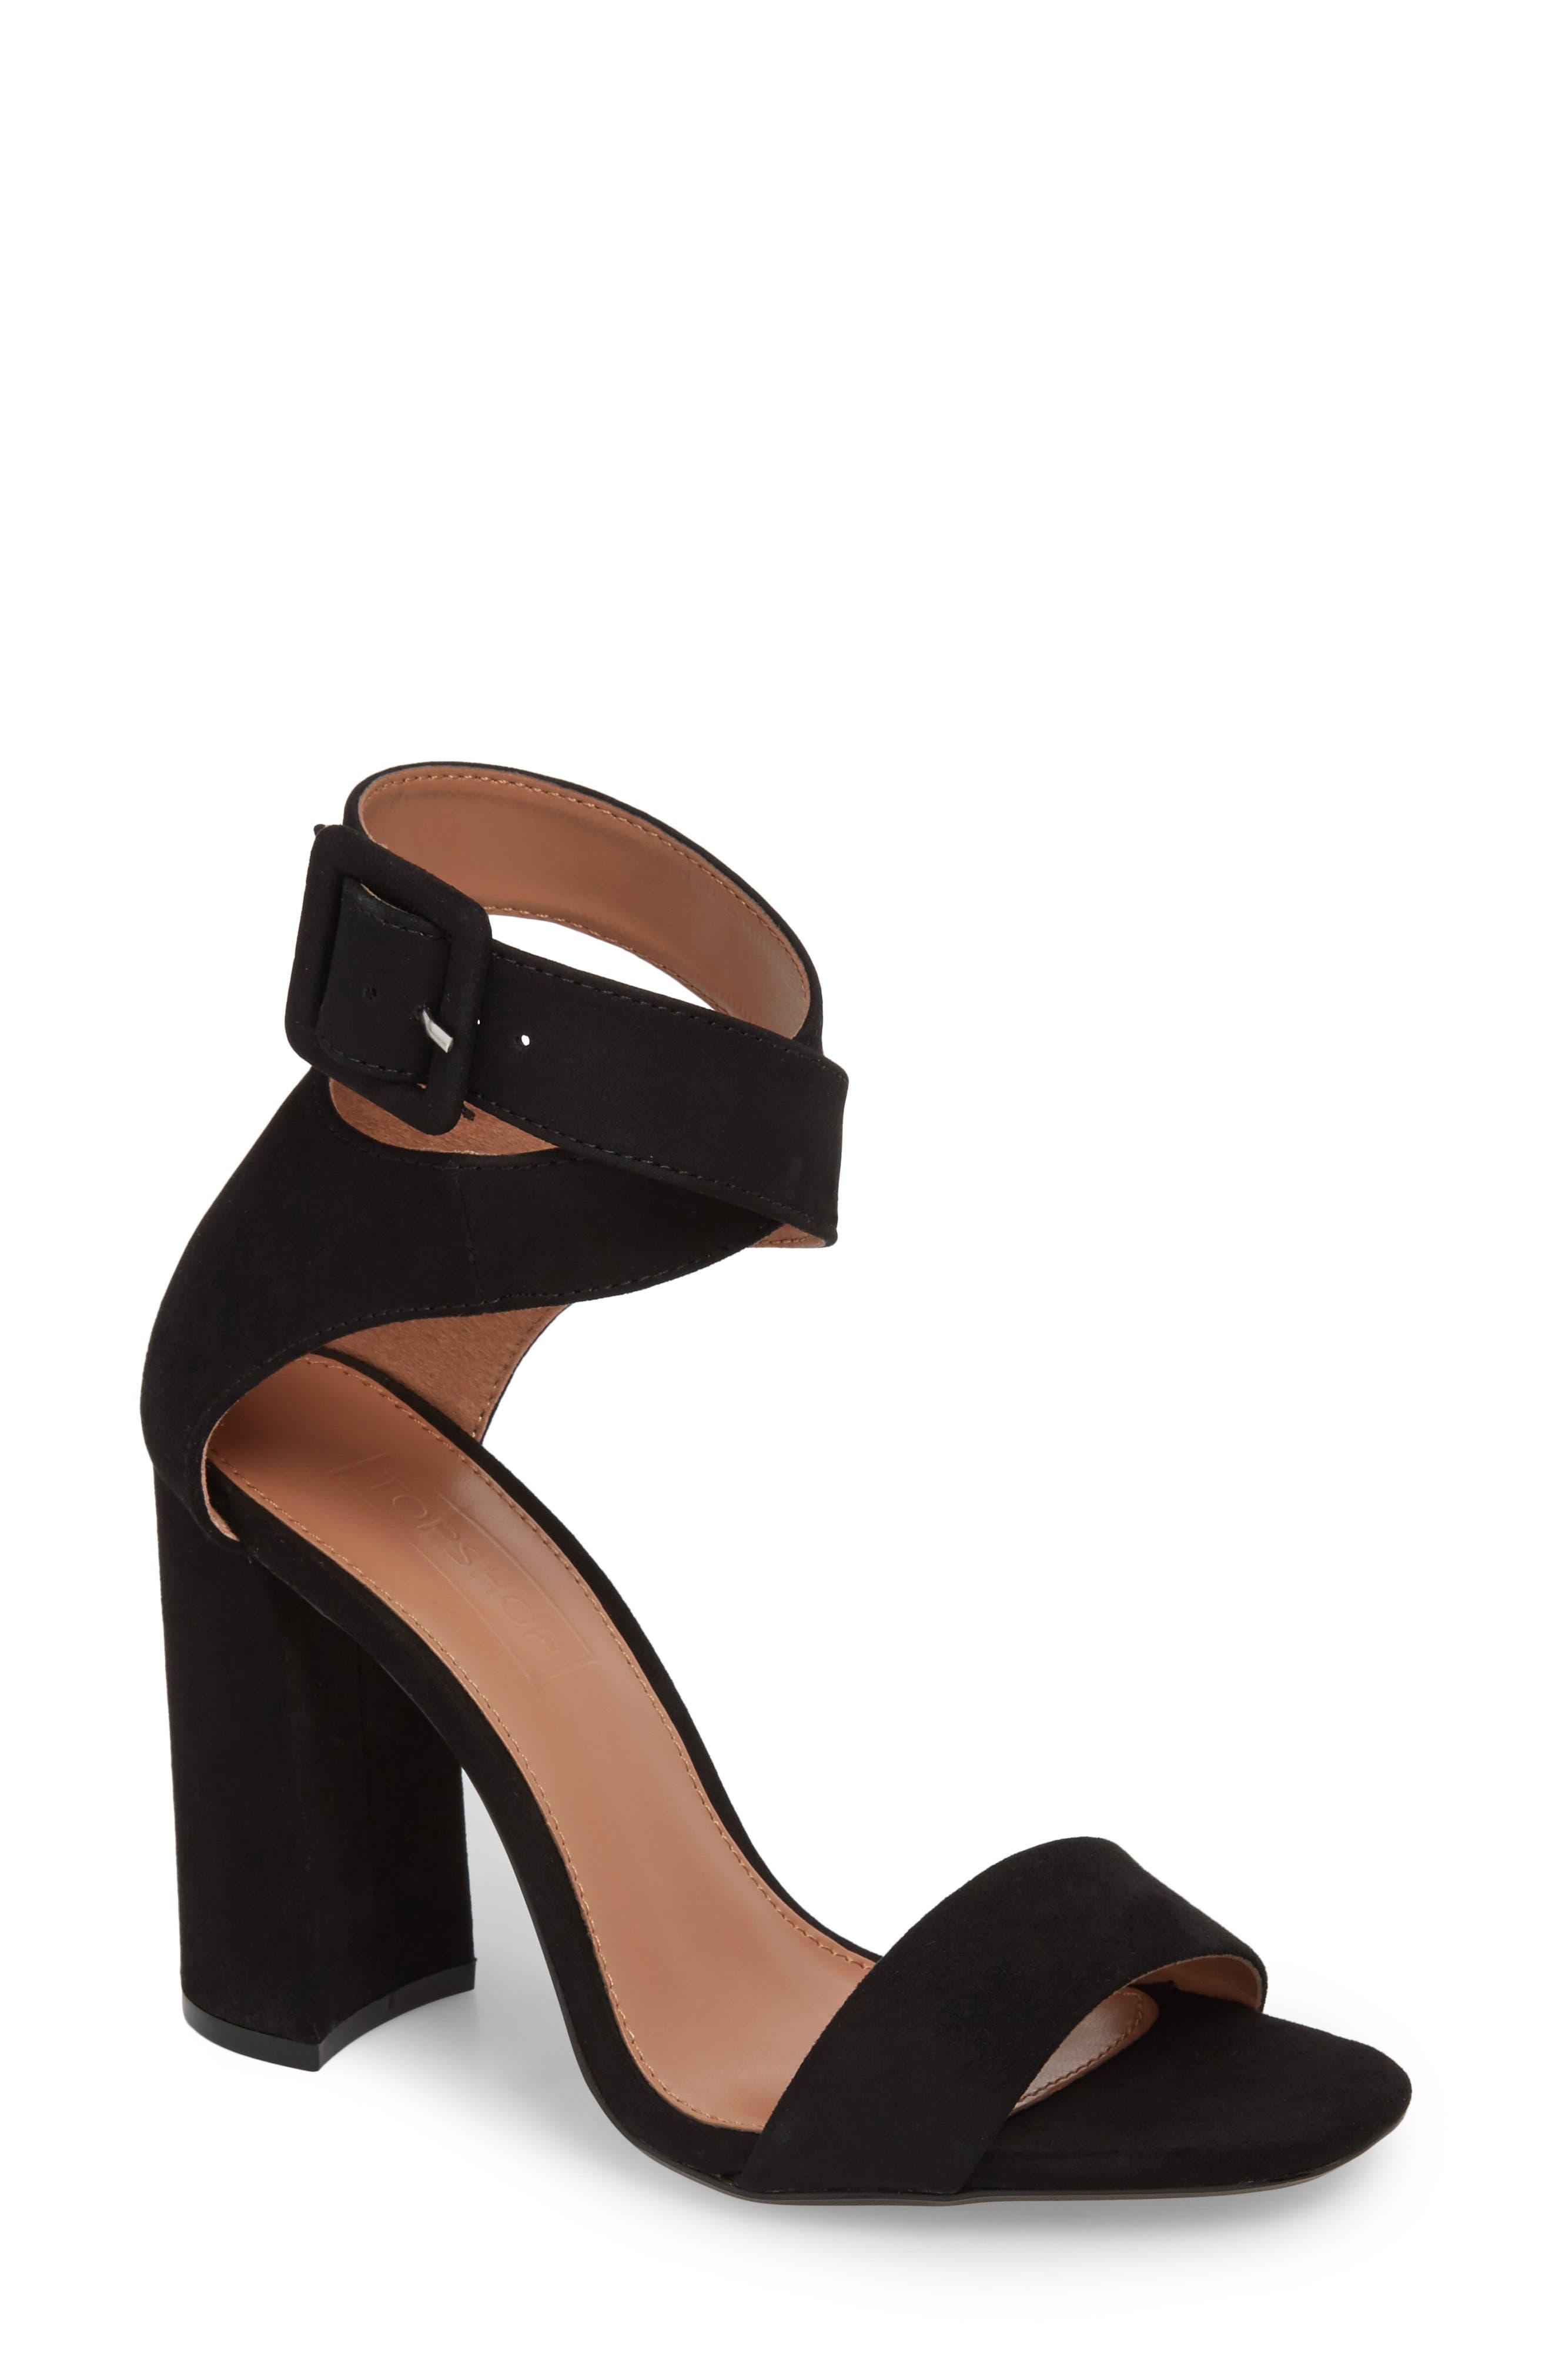 Sinitta Crossover Sandal,                         Main,                         color, Black